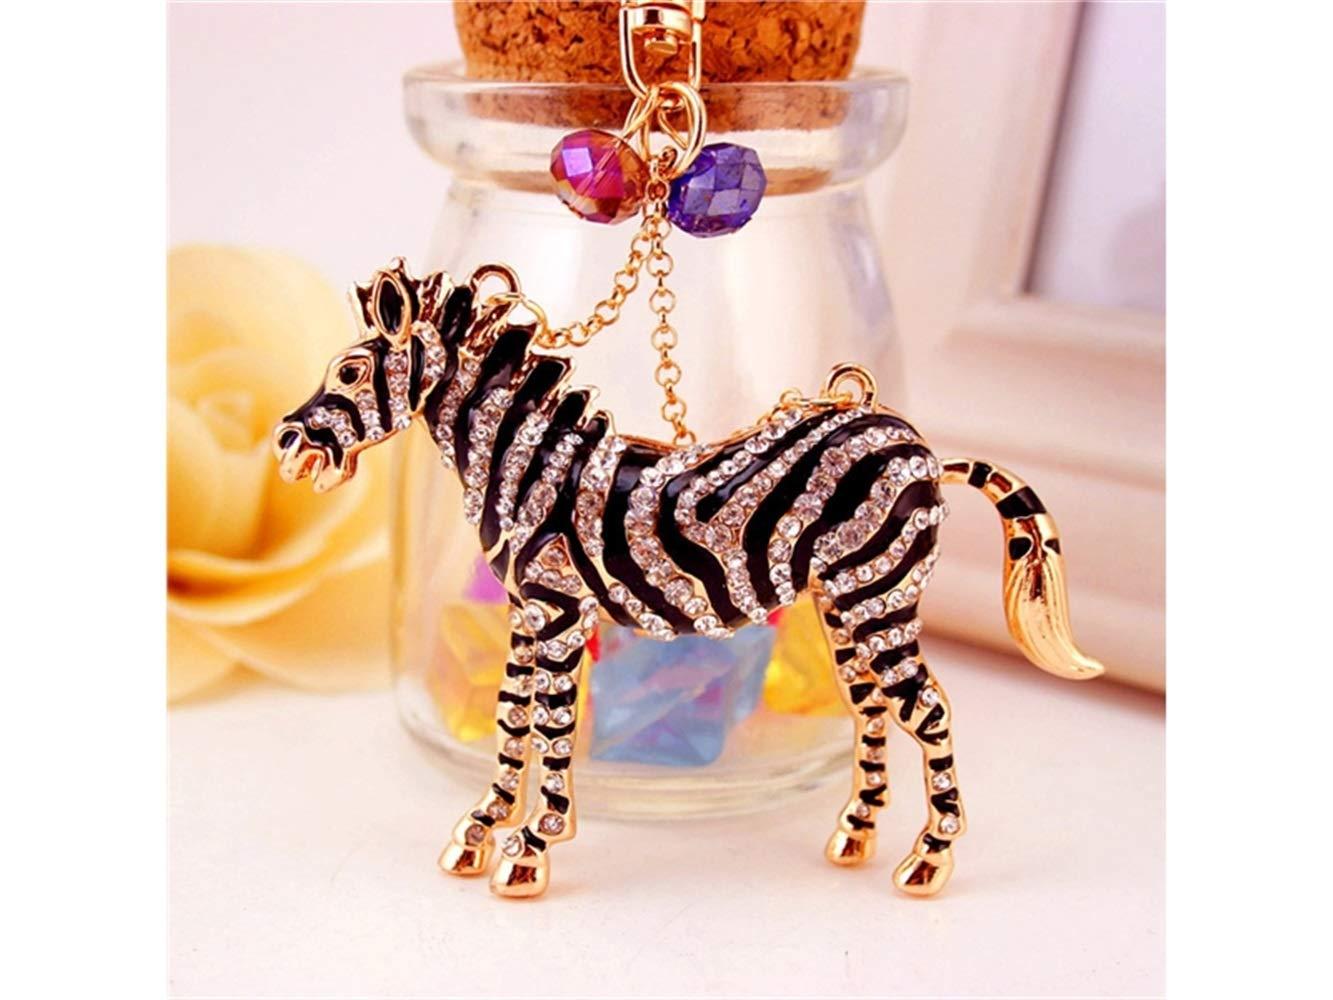 Car Keychain, Cute Exquisite Zebra Keychain Animal Key Trinket Car Bag Key Holder Decorations(Black) for Gift by Huasen (Image #5)